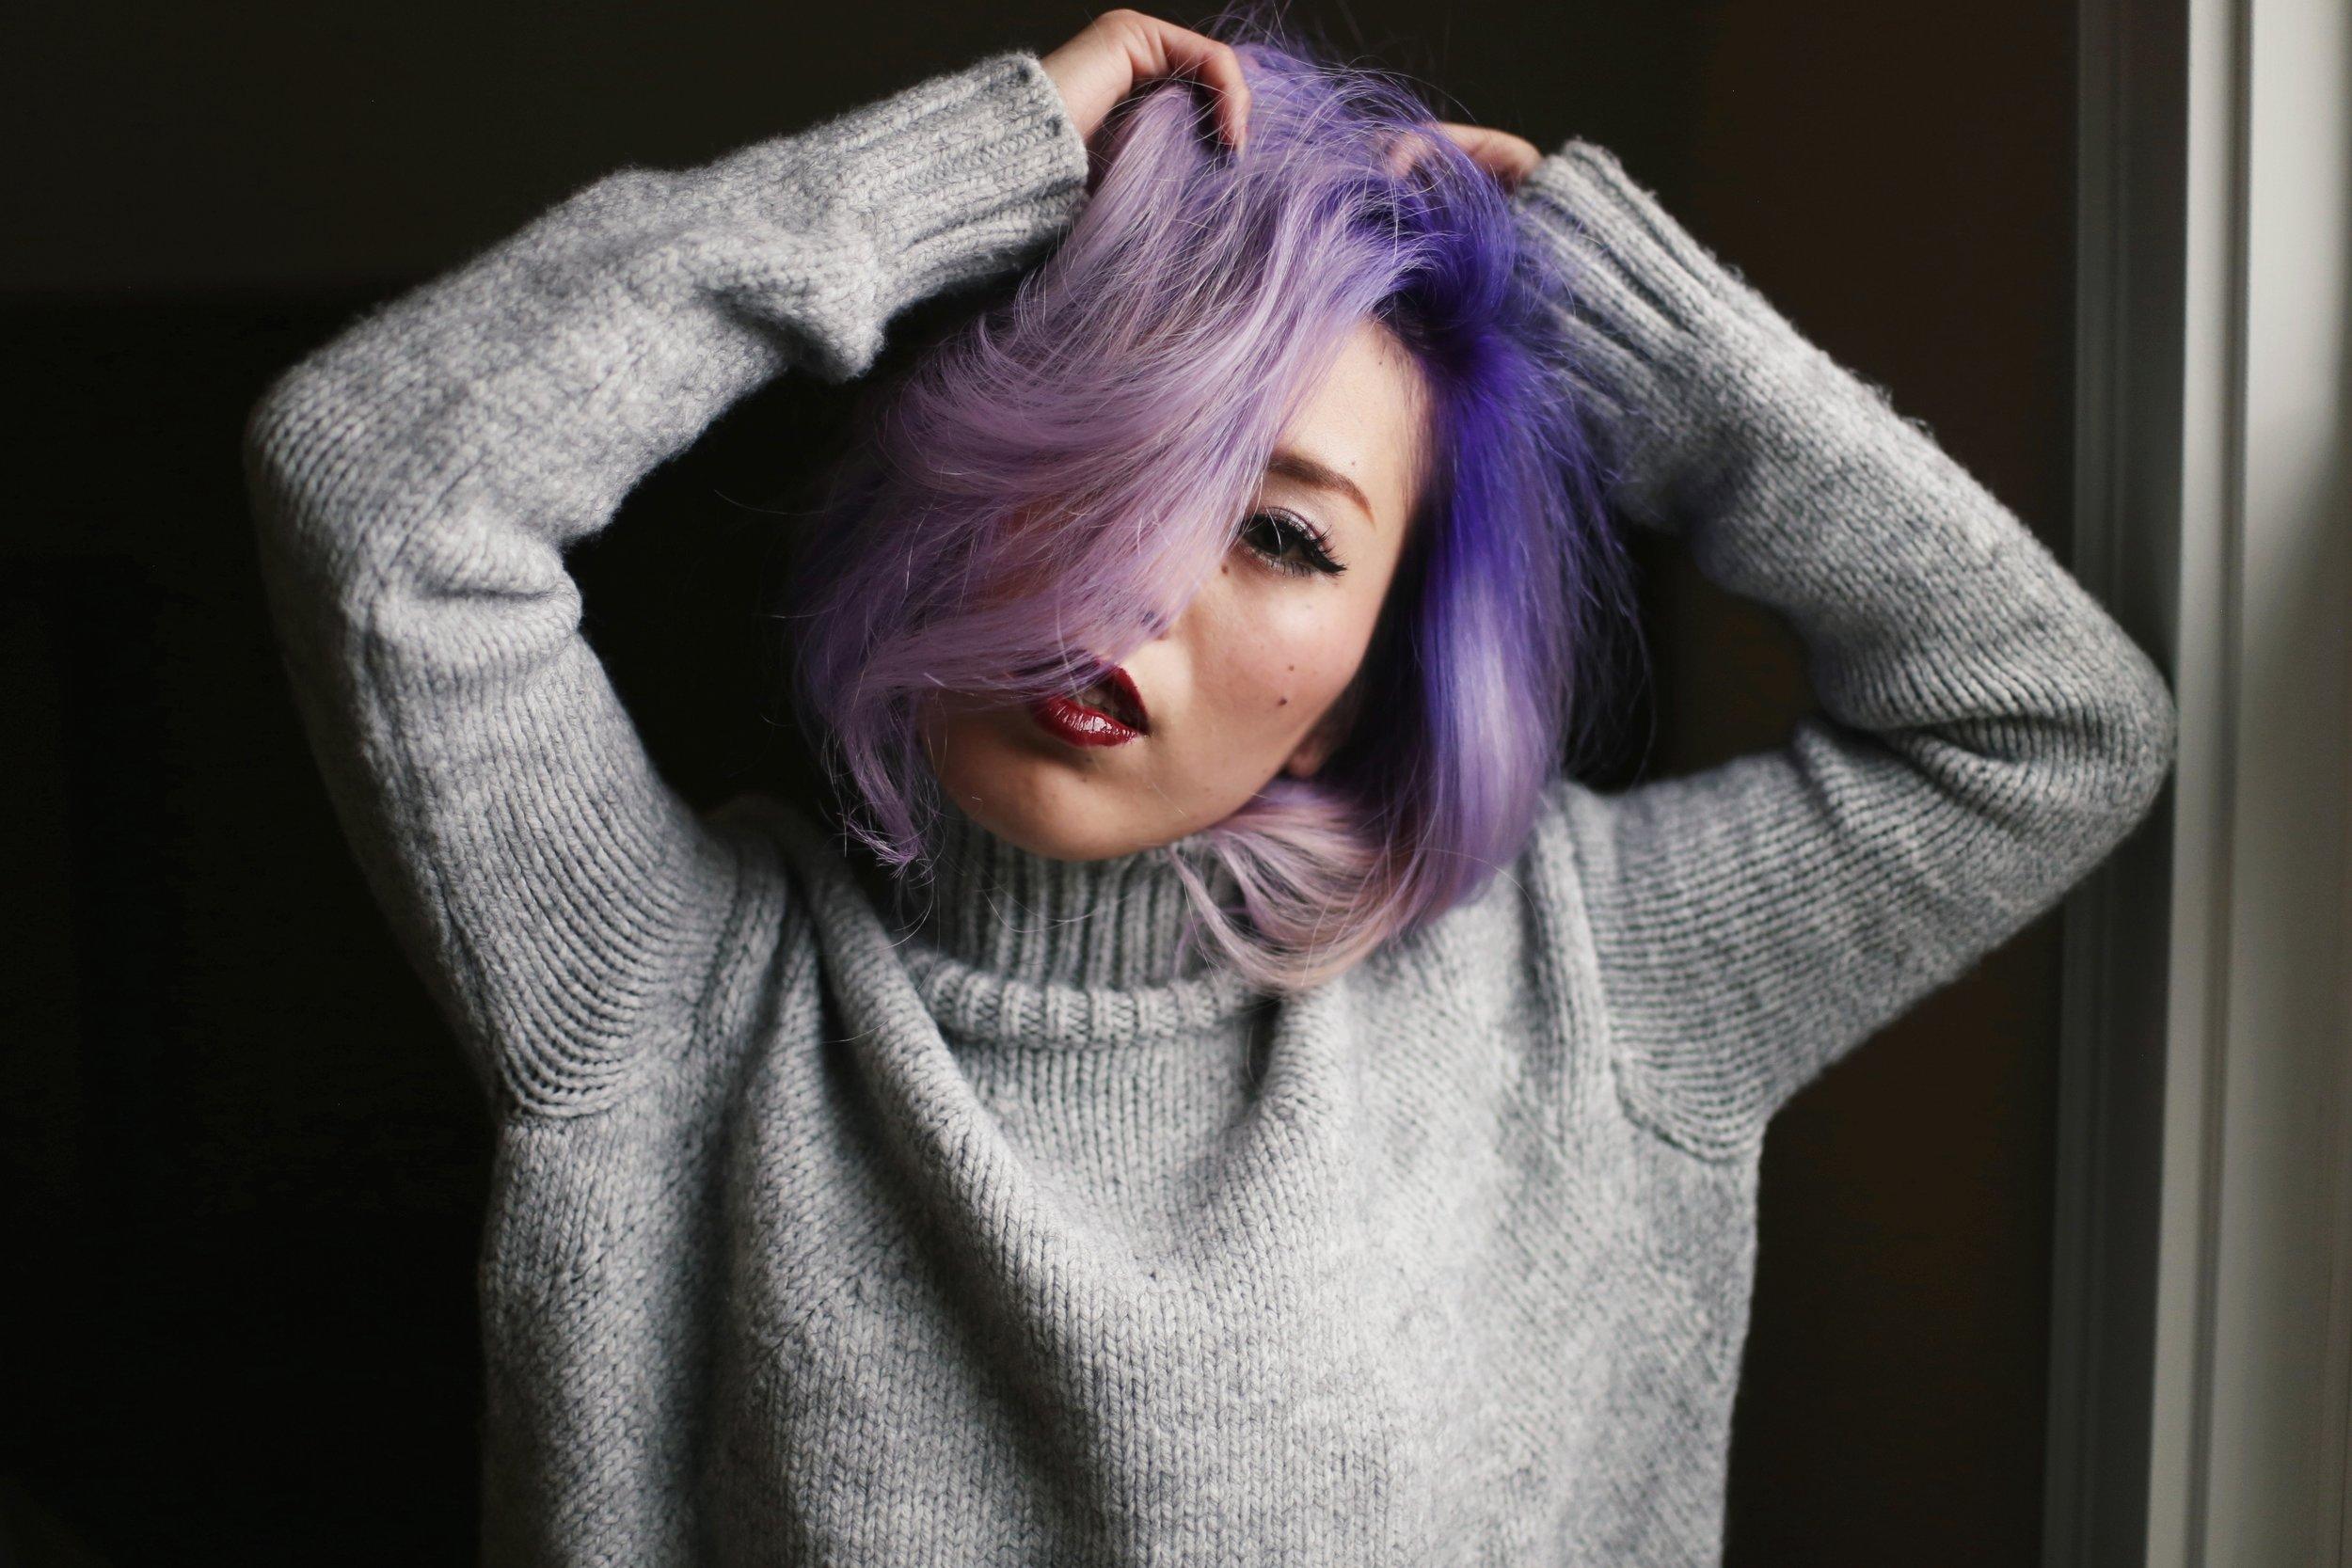 Boudoir Photo-black and white photography-sweater weather-turtle neck sweater-black lingerie-dark lipstick-japanese-Aika's Love Closet-Seattle model-Seattle Style blogger-Lavender Hair-colored Hair-Mermaid Hair-Zara Sweater 3